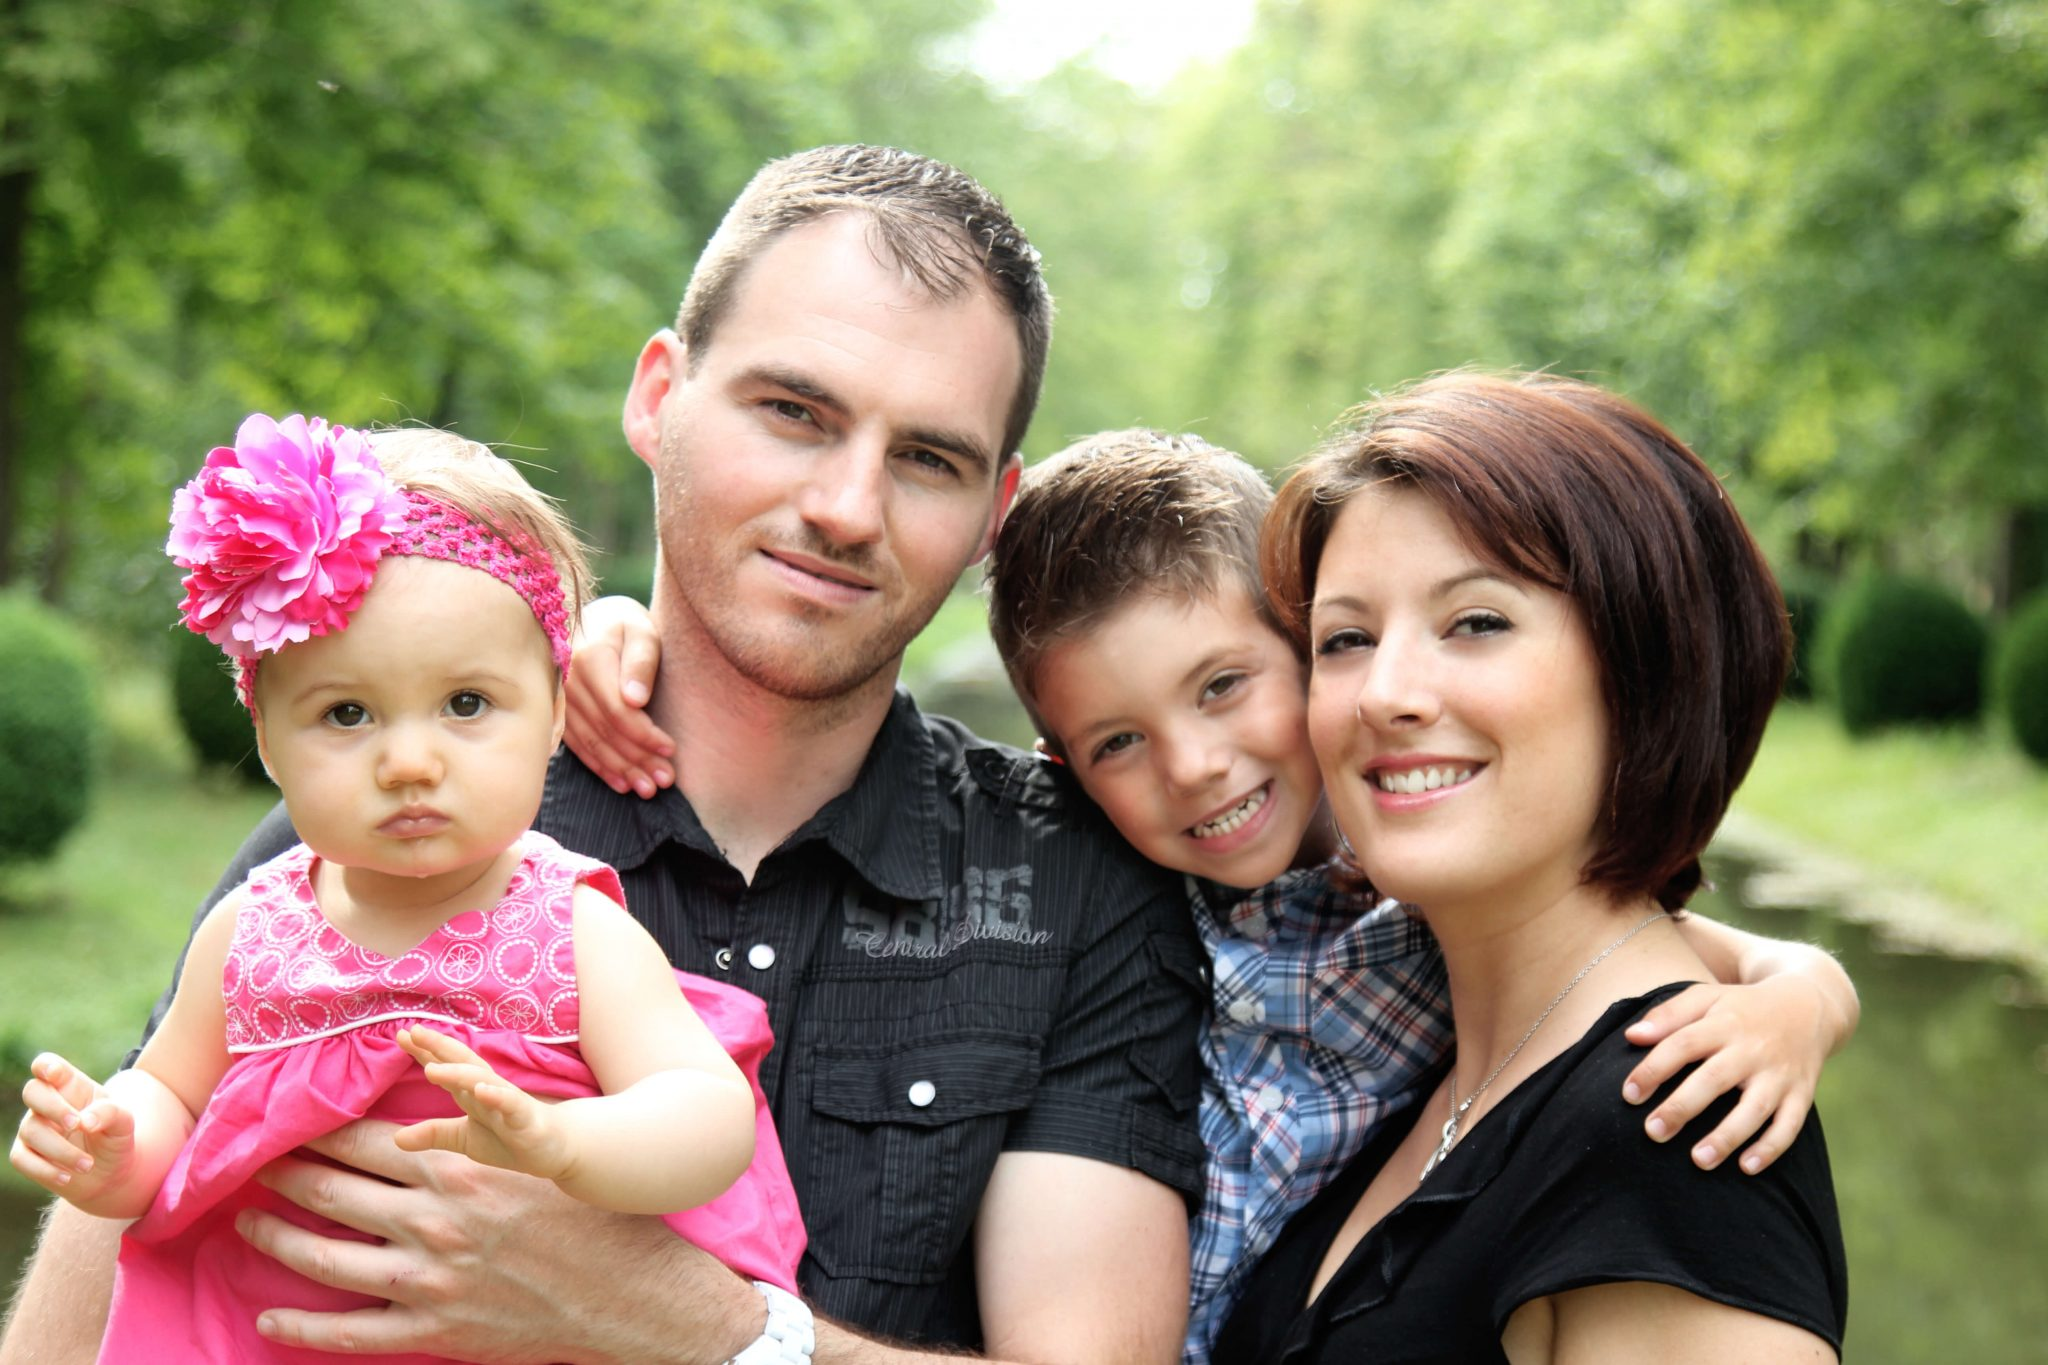 photographe-famille-sax-photographie